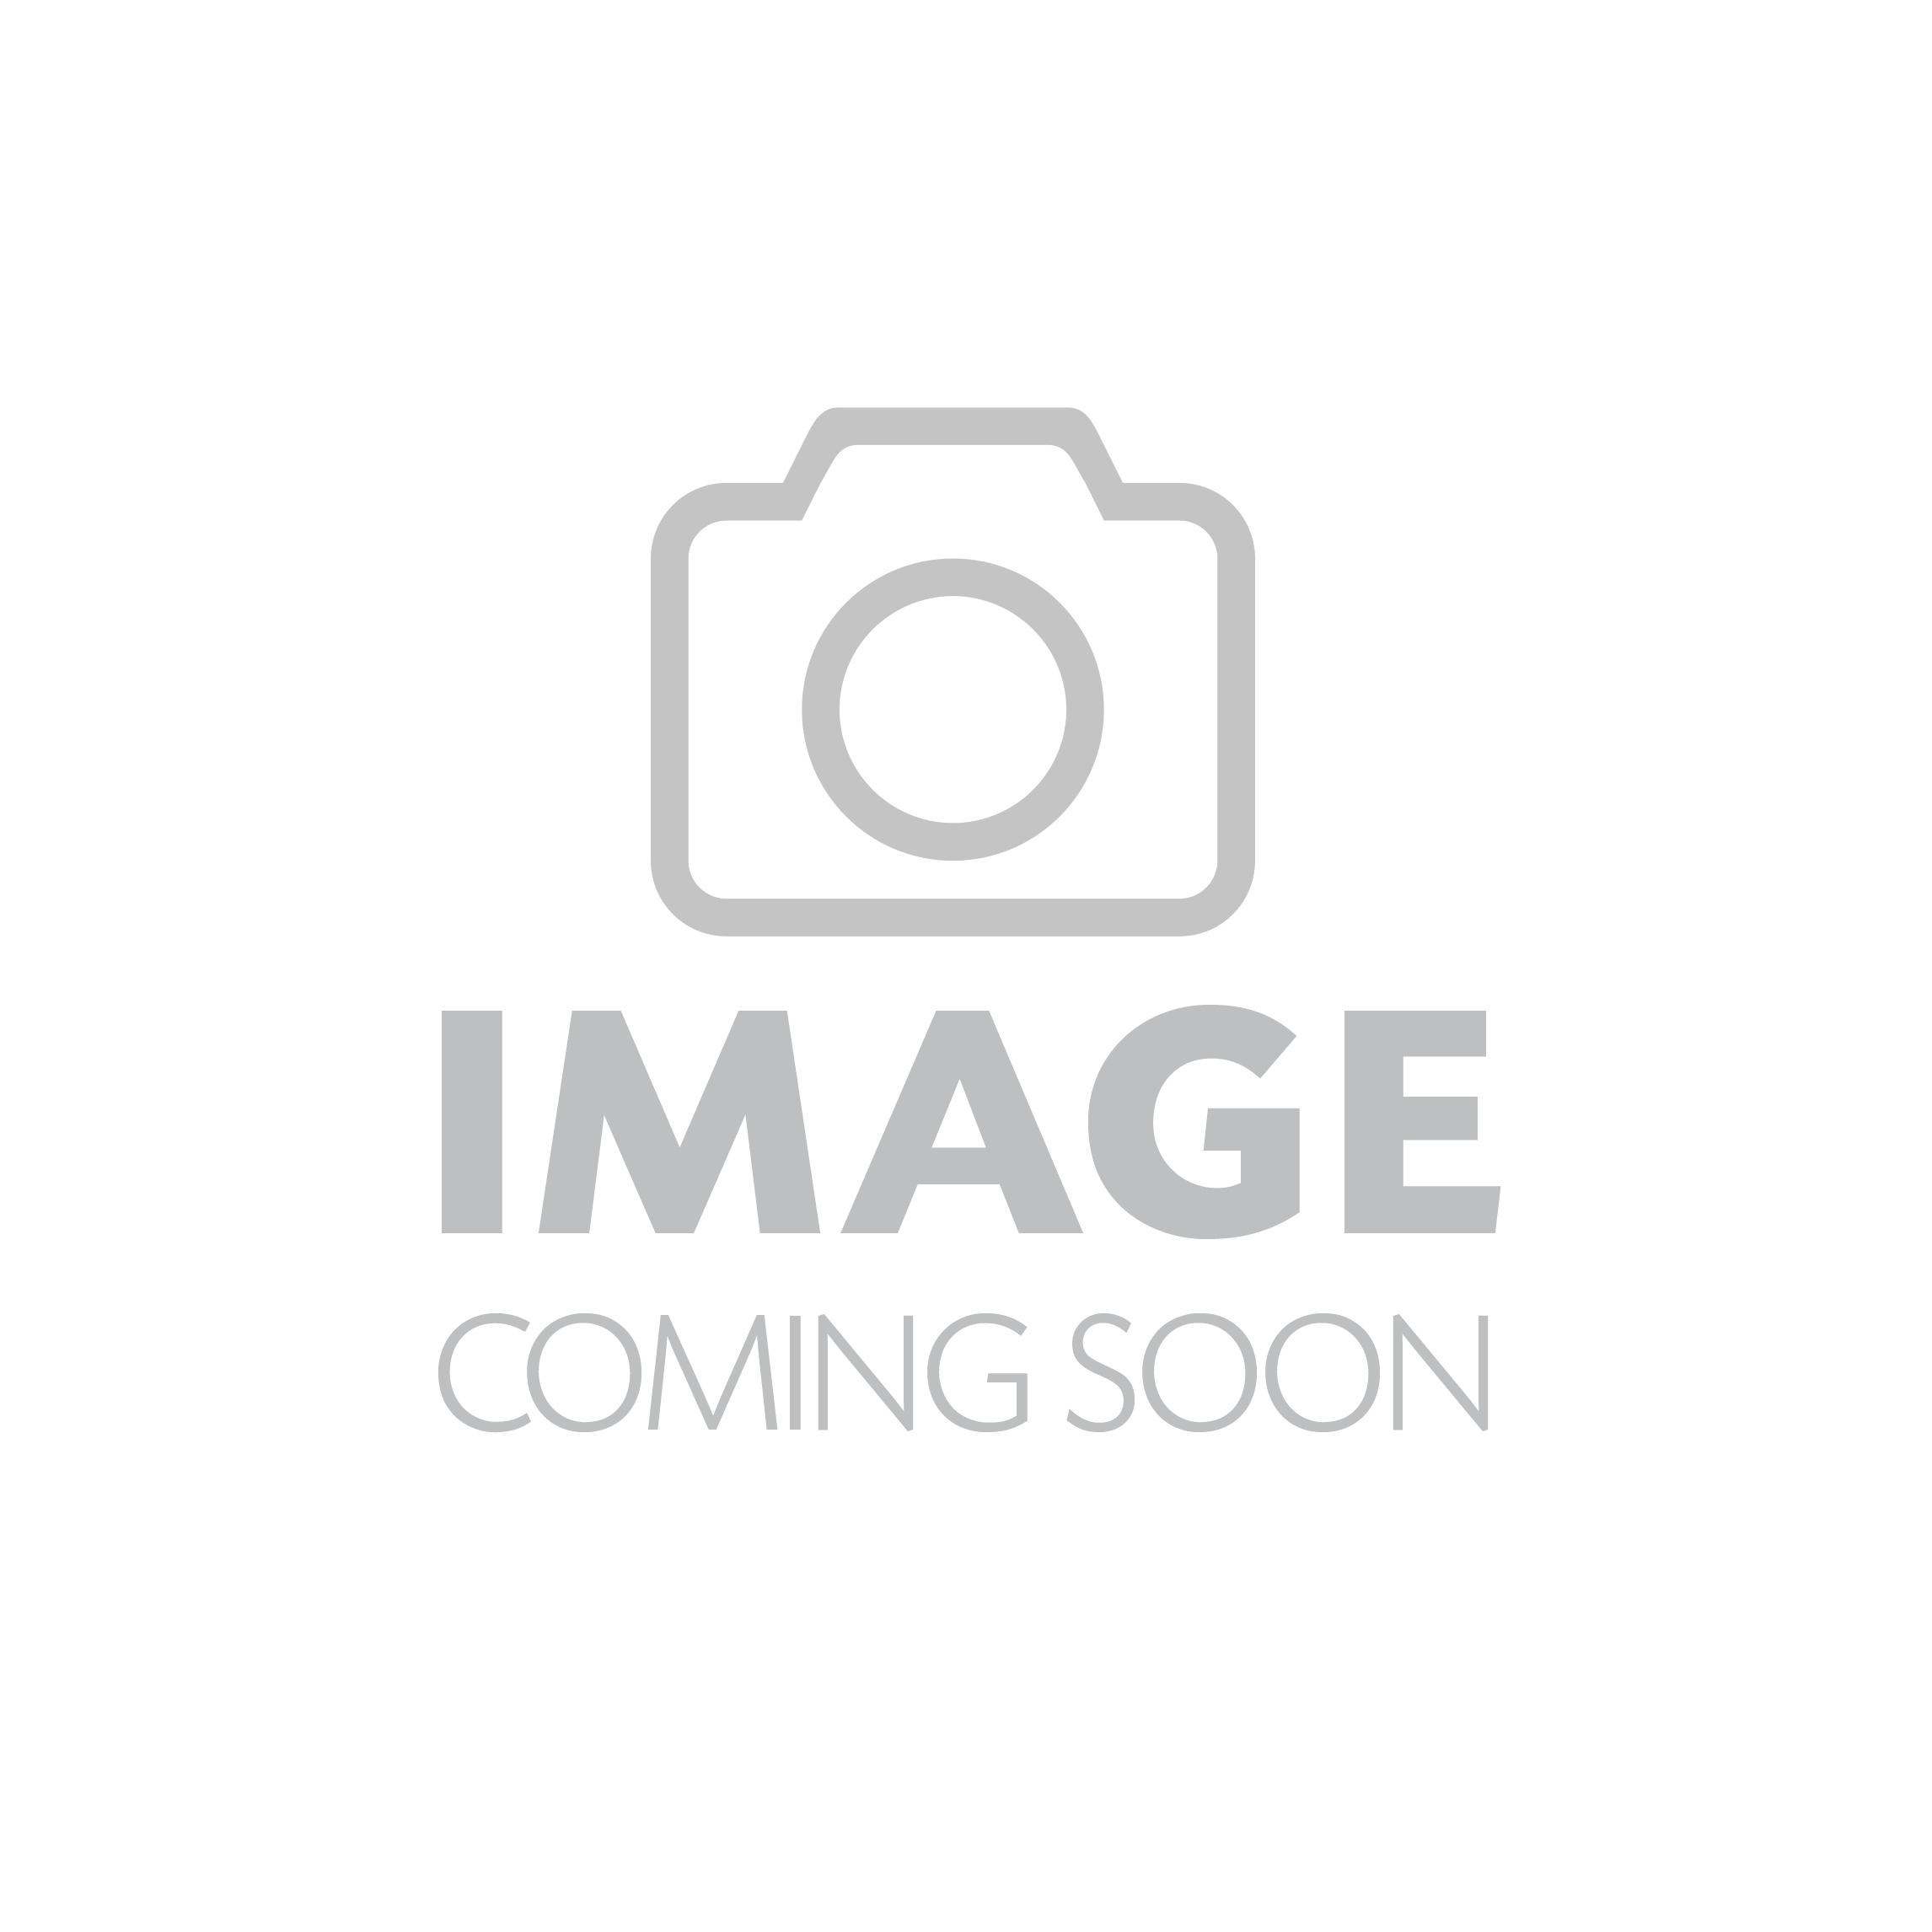 Sandringham 21 Universal Seat And Cover (White) Plastic Hinges Bottom Fix